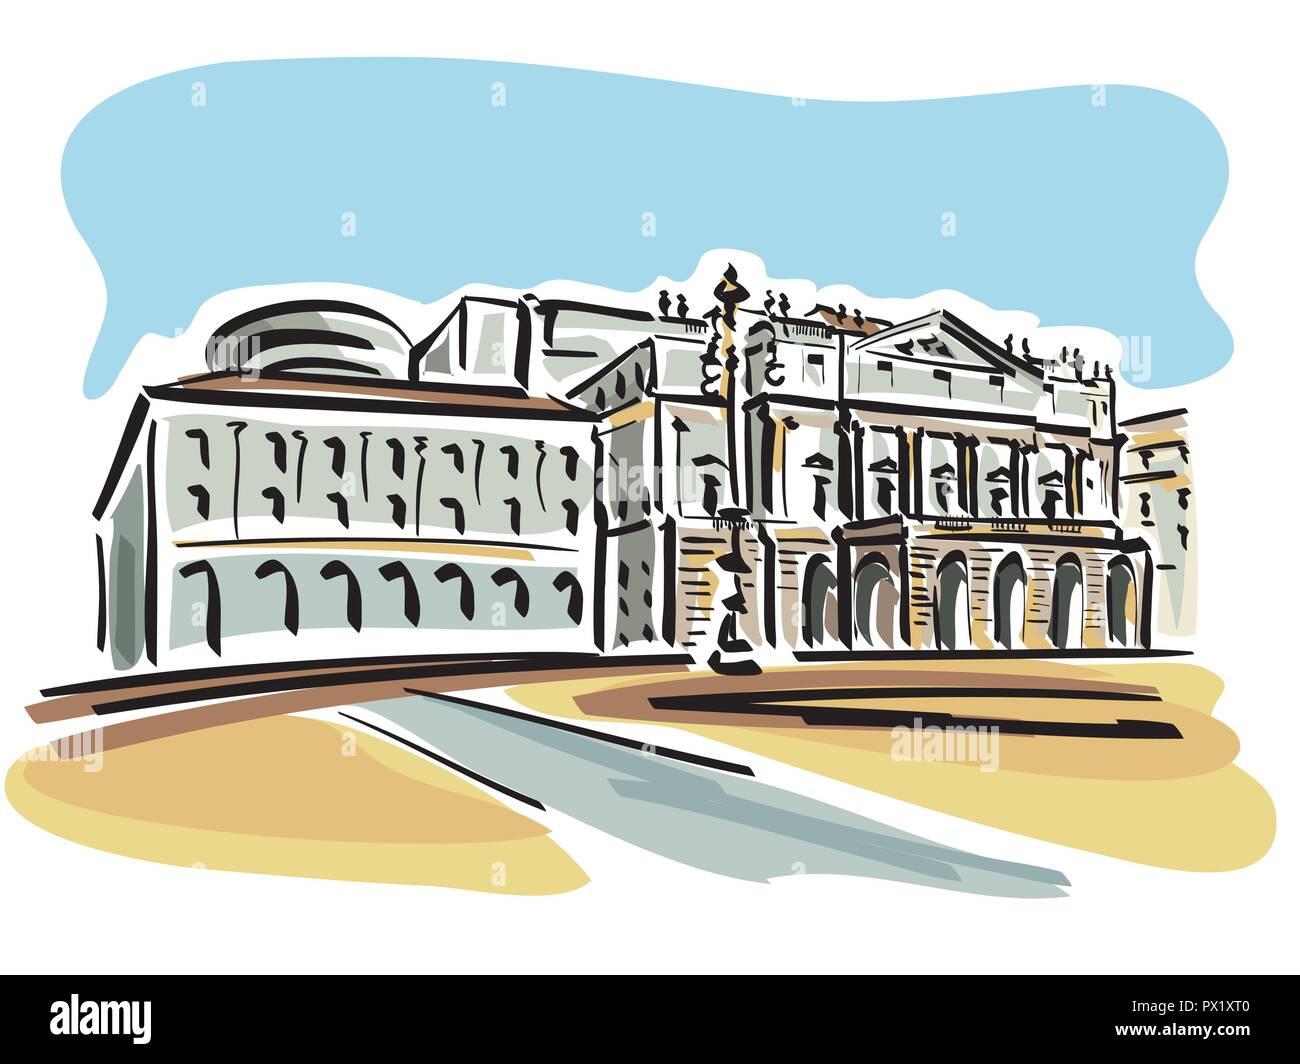 vector illustration of the La Scala Opera House in Milan - Stock Vector